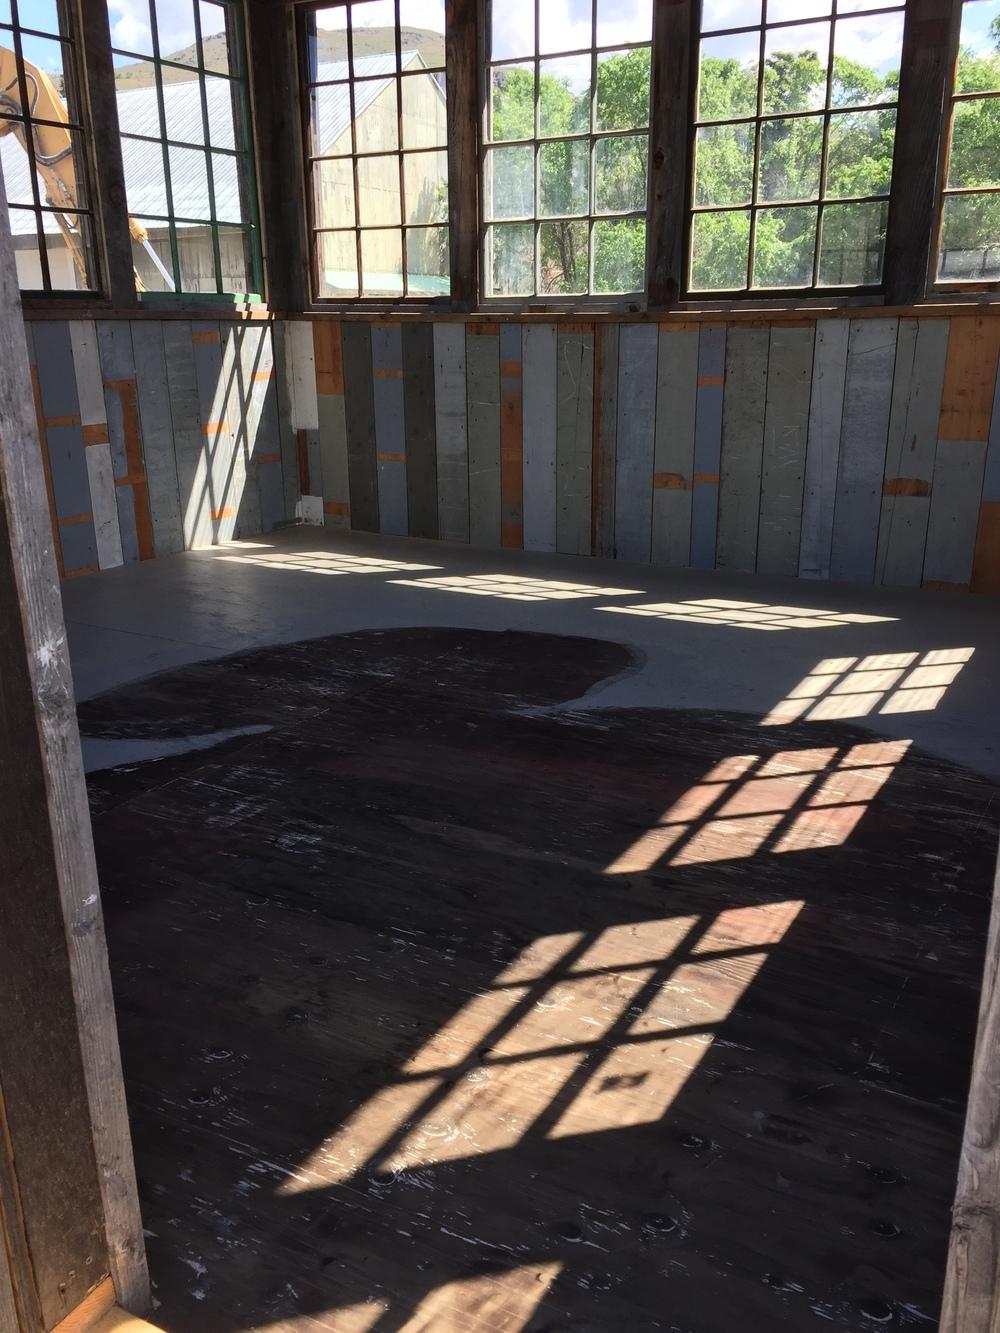 LO stained floor 2.jpg